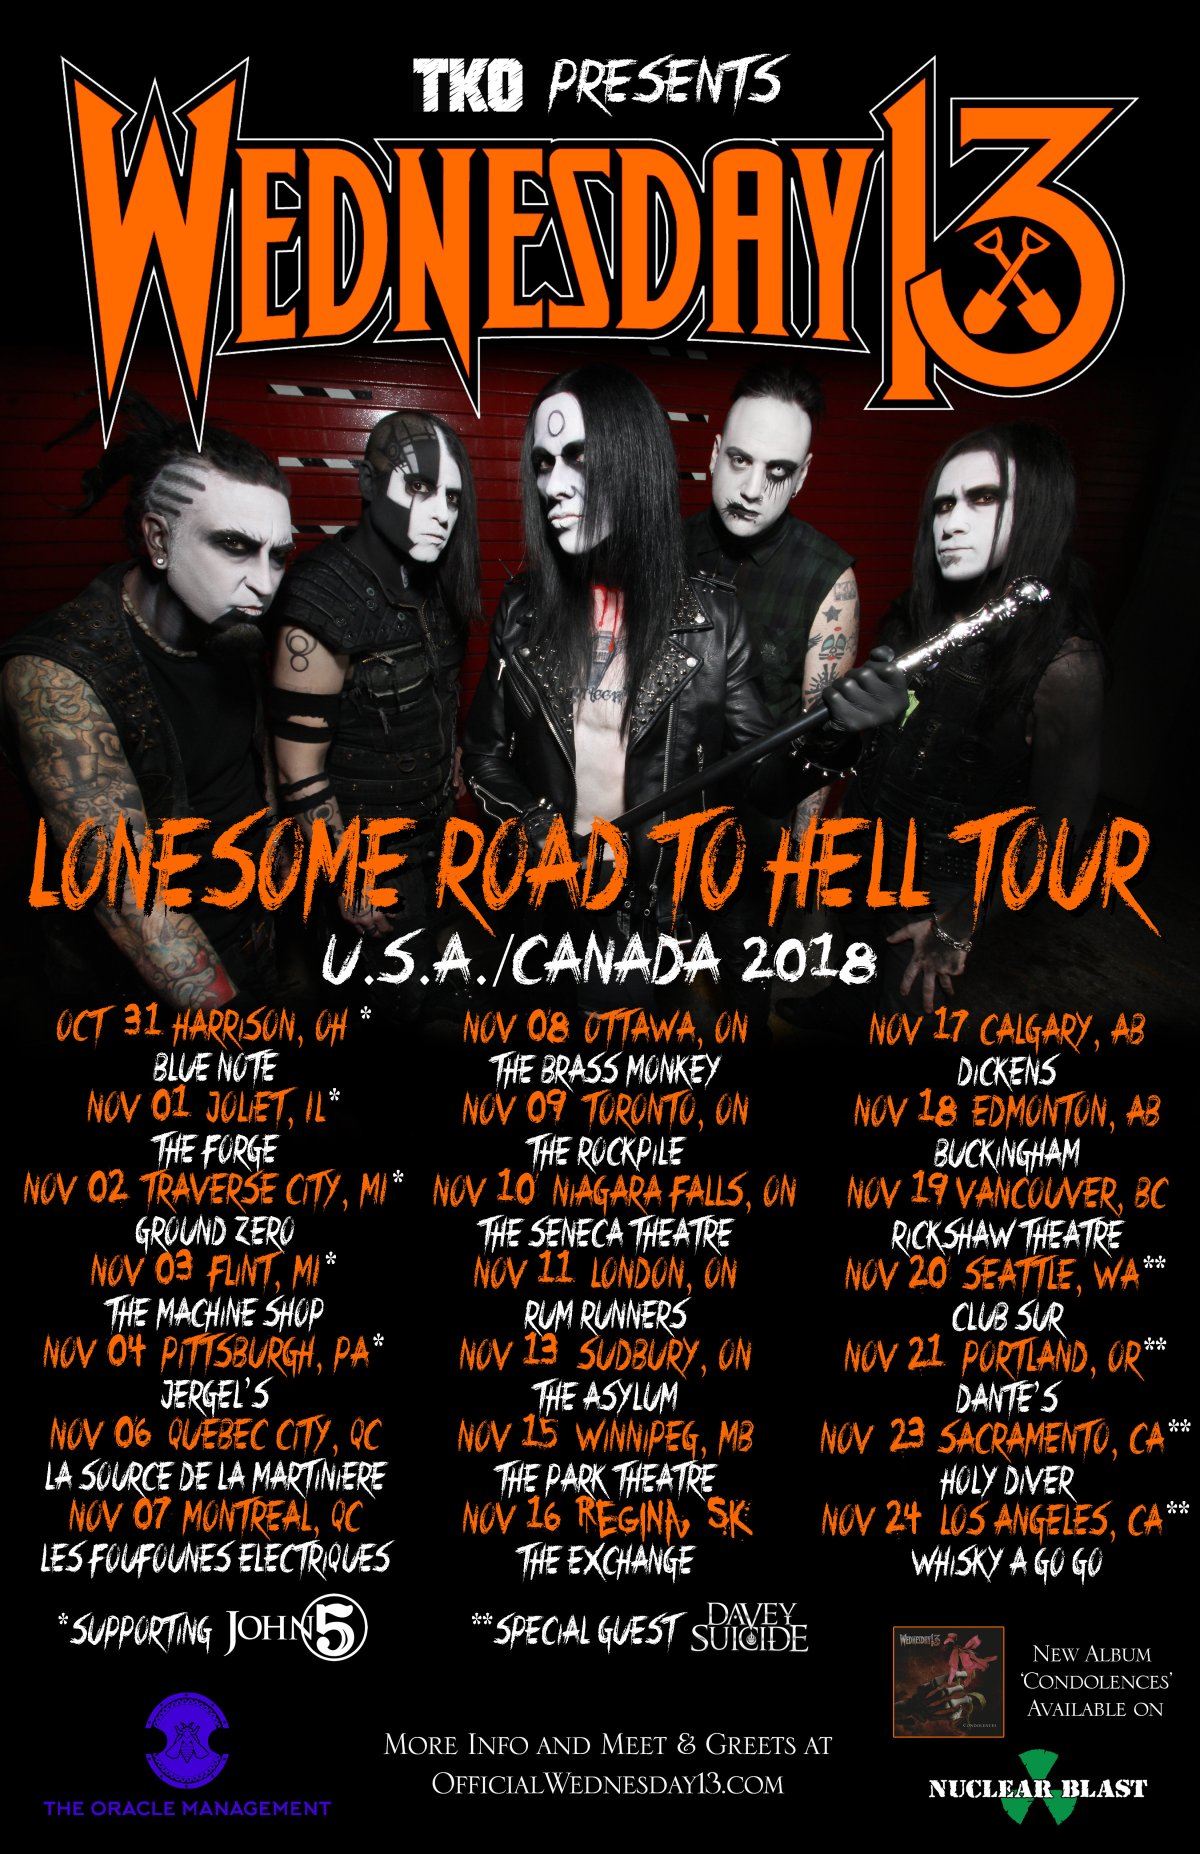 Wednesday13announces North American tourdates.